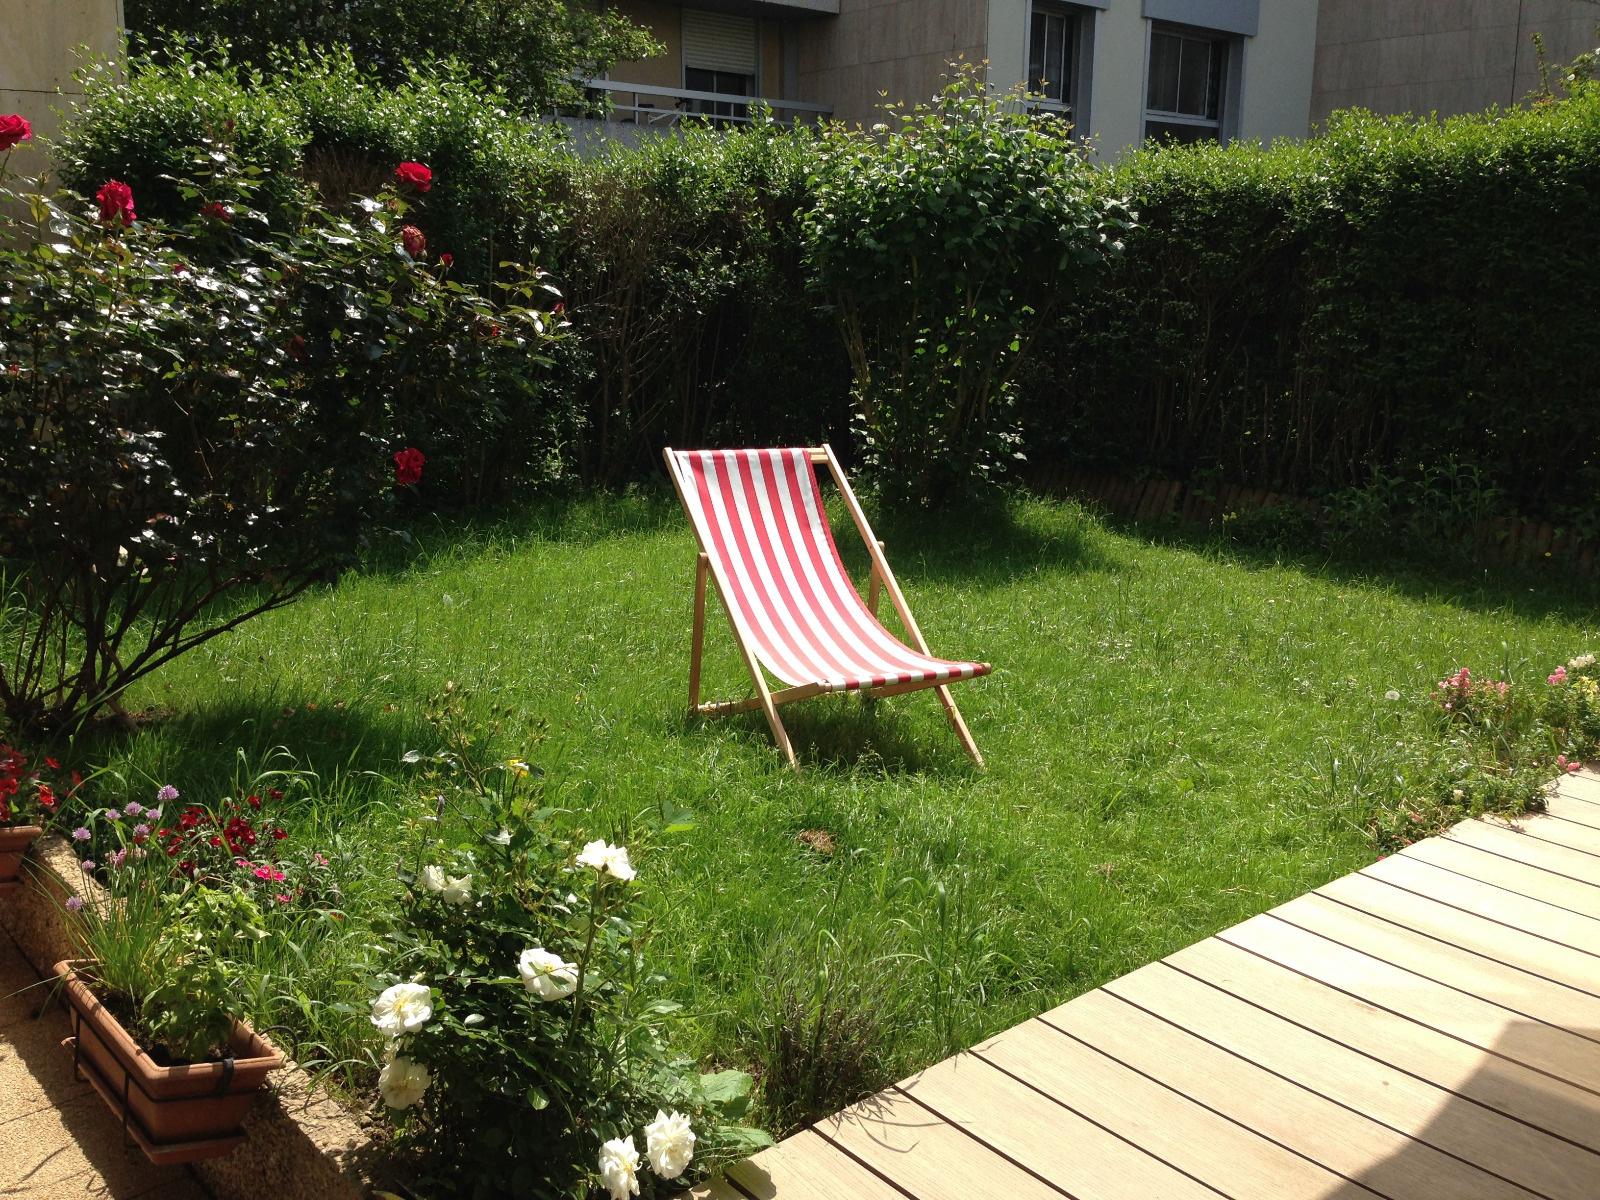 Mobilier Jardin Grenoble Boulogne Billancourt - Maison Design ...